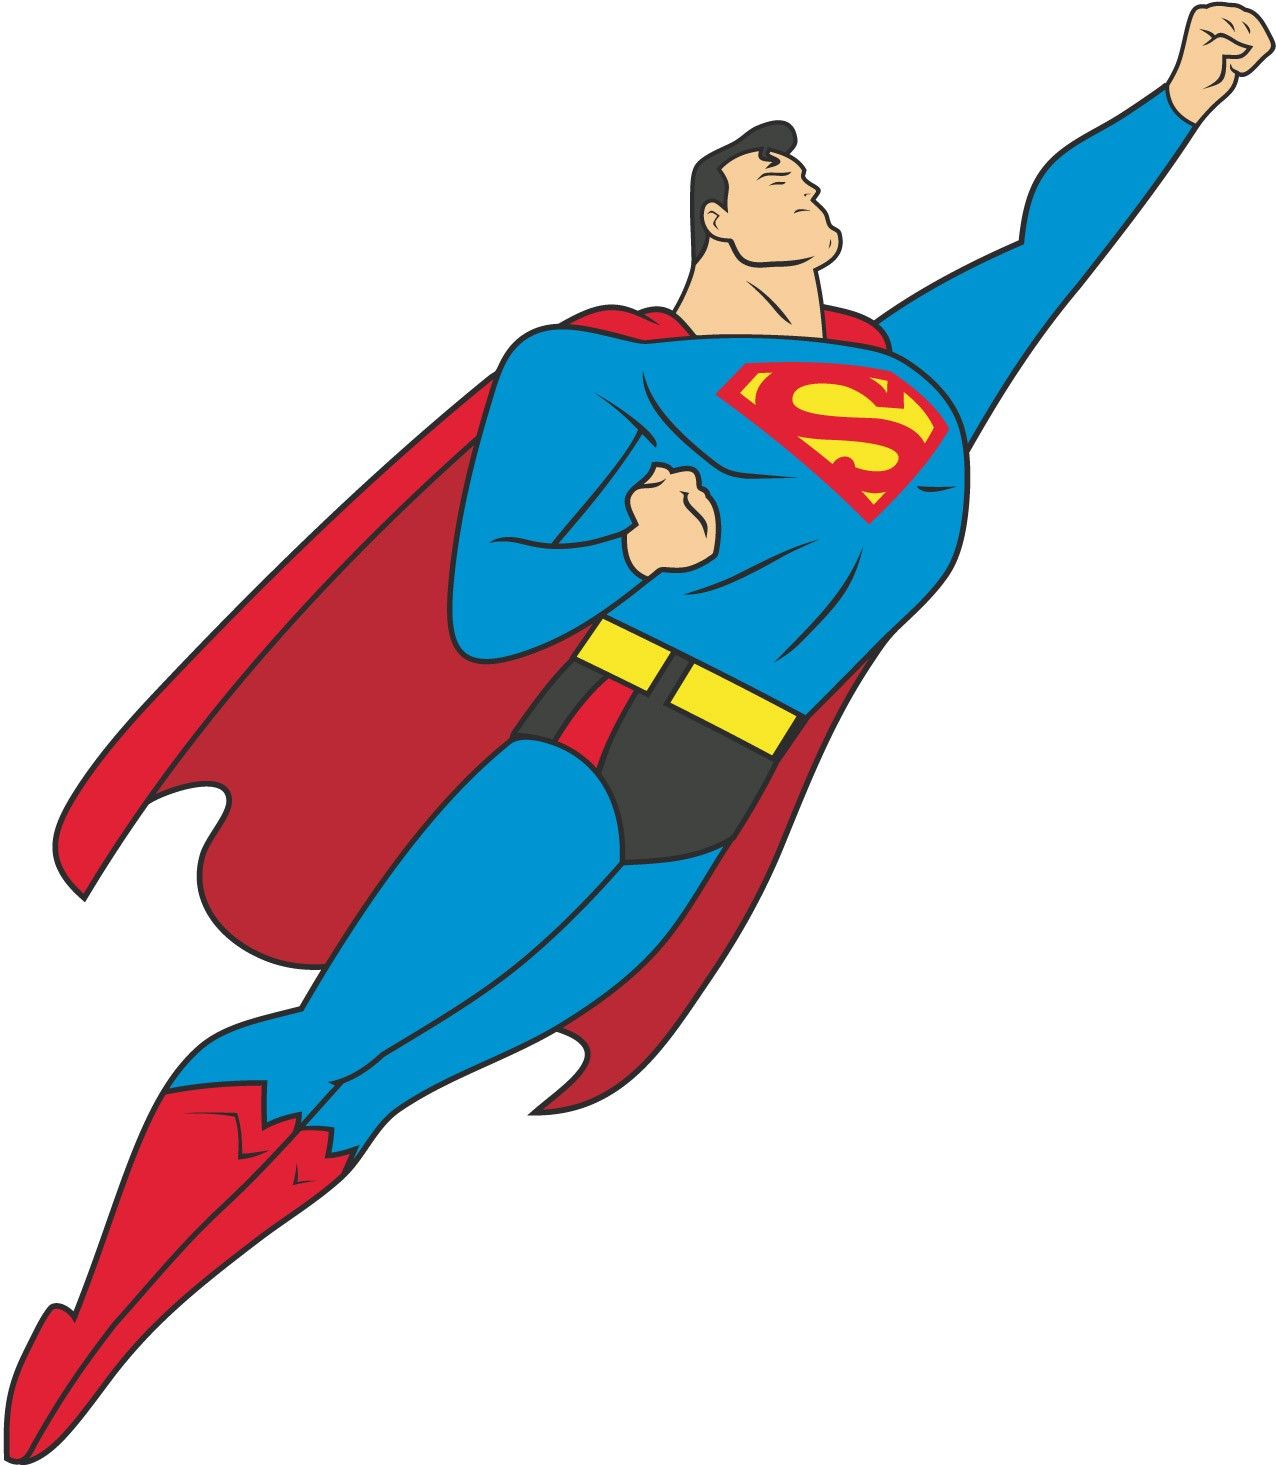 superman clip art wesomeness hero clip art rh pinterest com Justice League Emblem Justice League Drawings